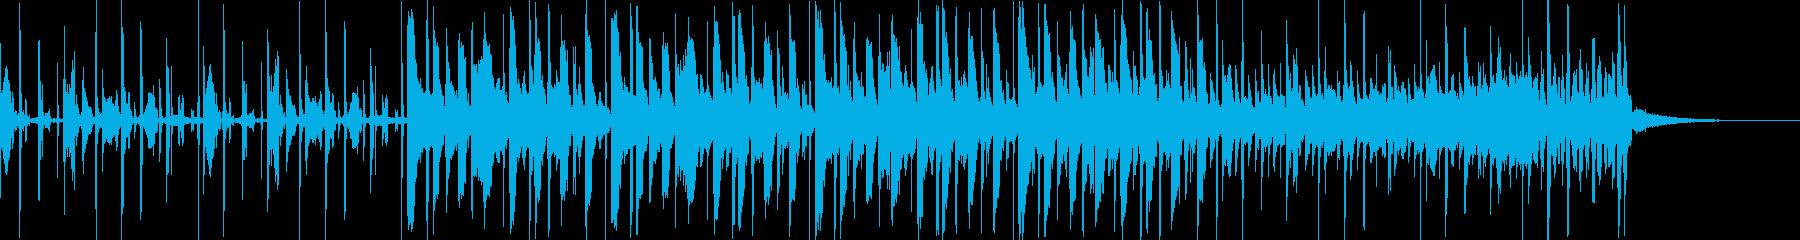 KANT無機質ジングル2006083の再生済みの波形